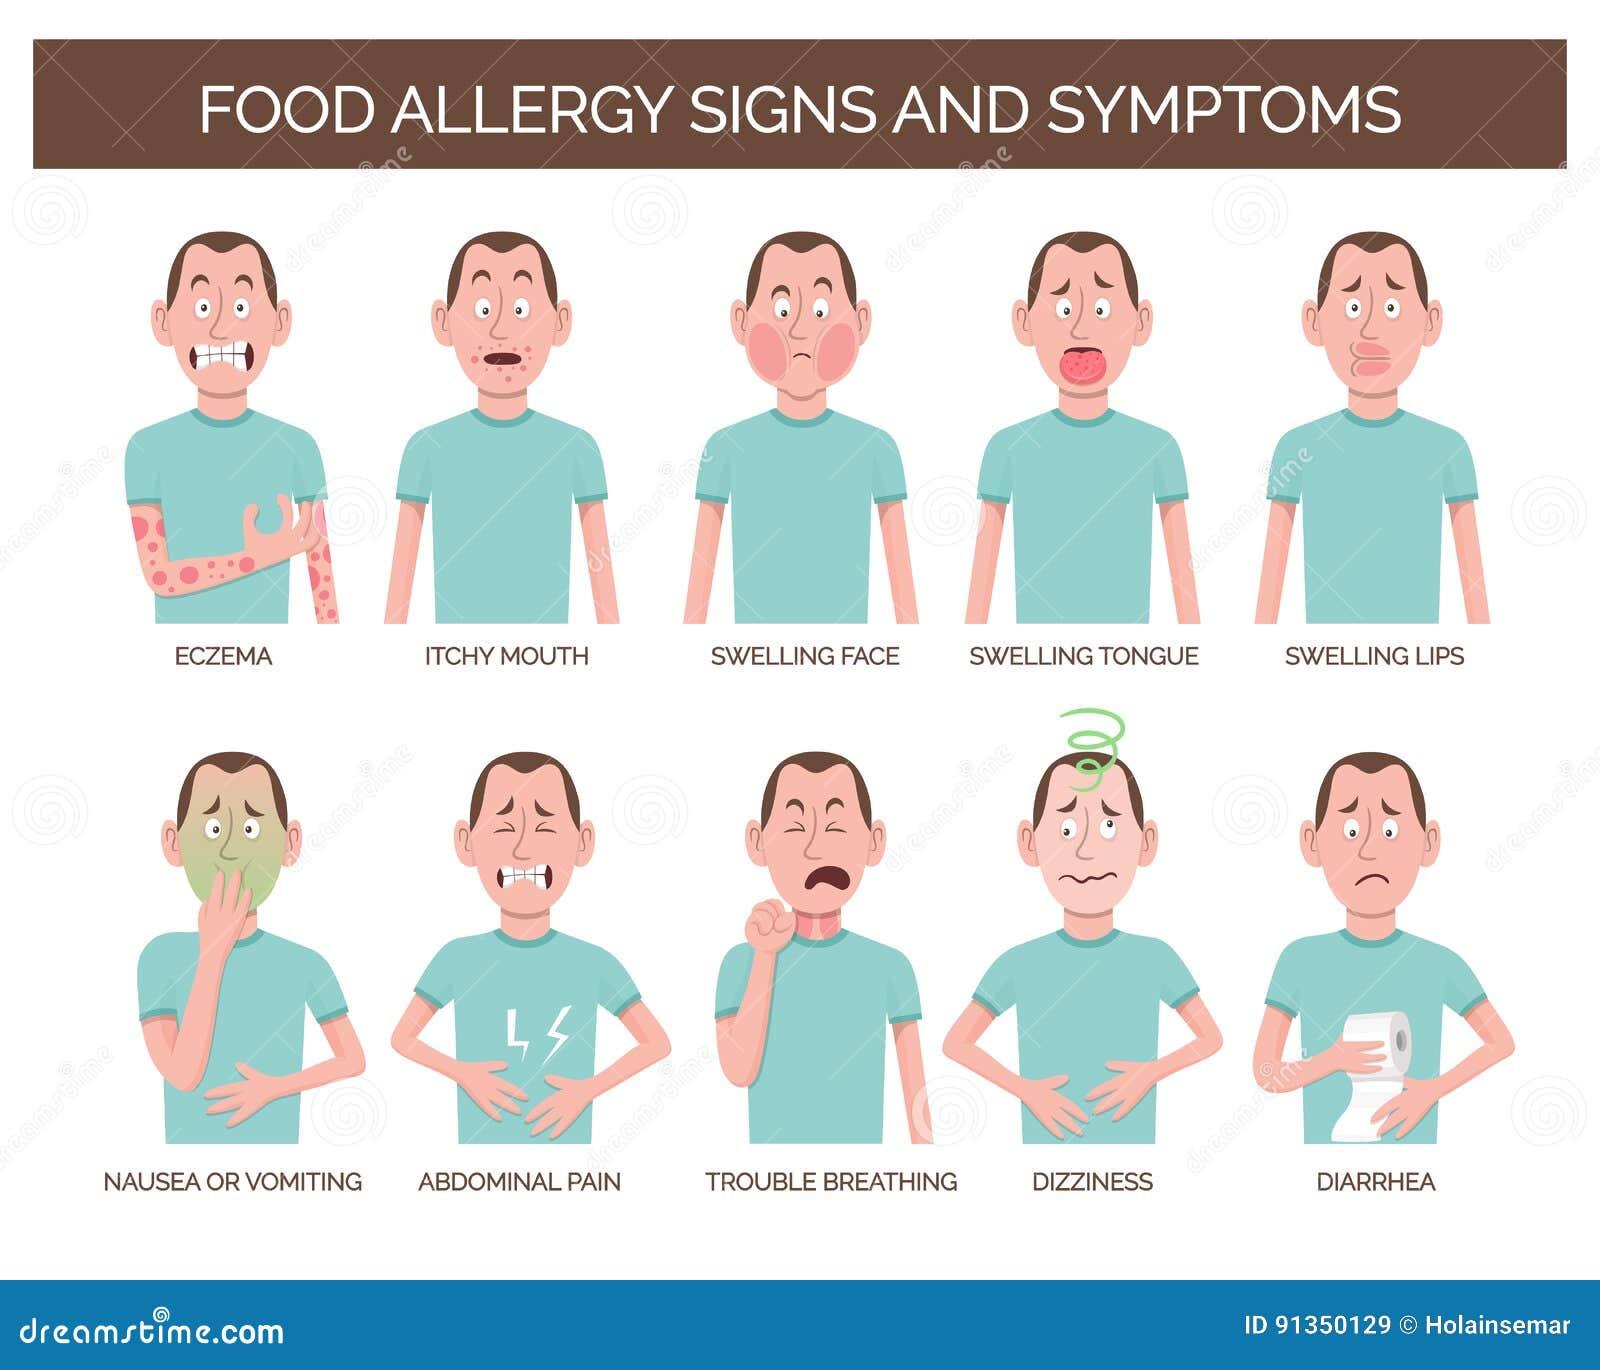 signes et sympt mes d 39 allergie alimentaire illustration de vecteur illustration du m decine. Black Bedroom Furniture Sets. Home Design Ideas